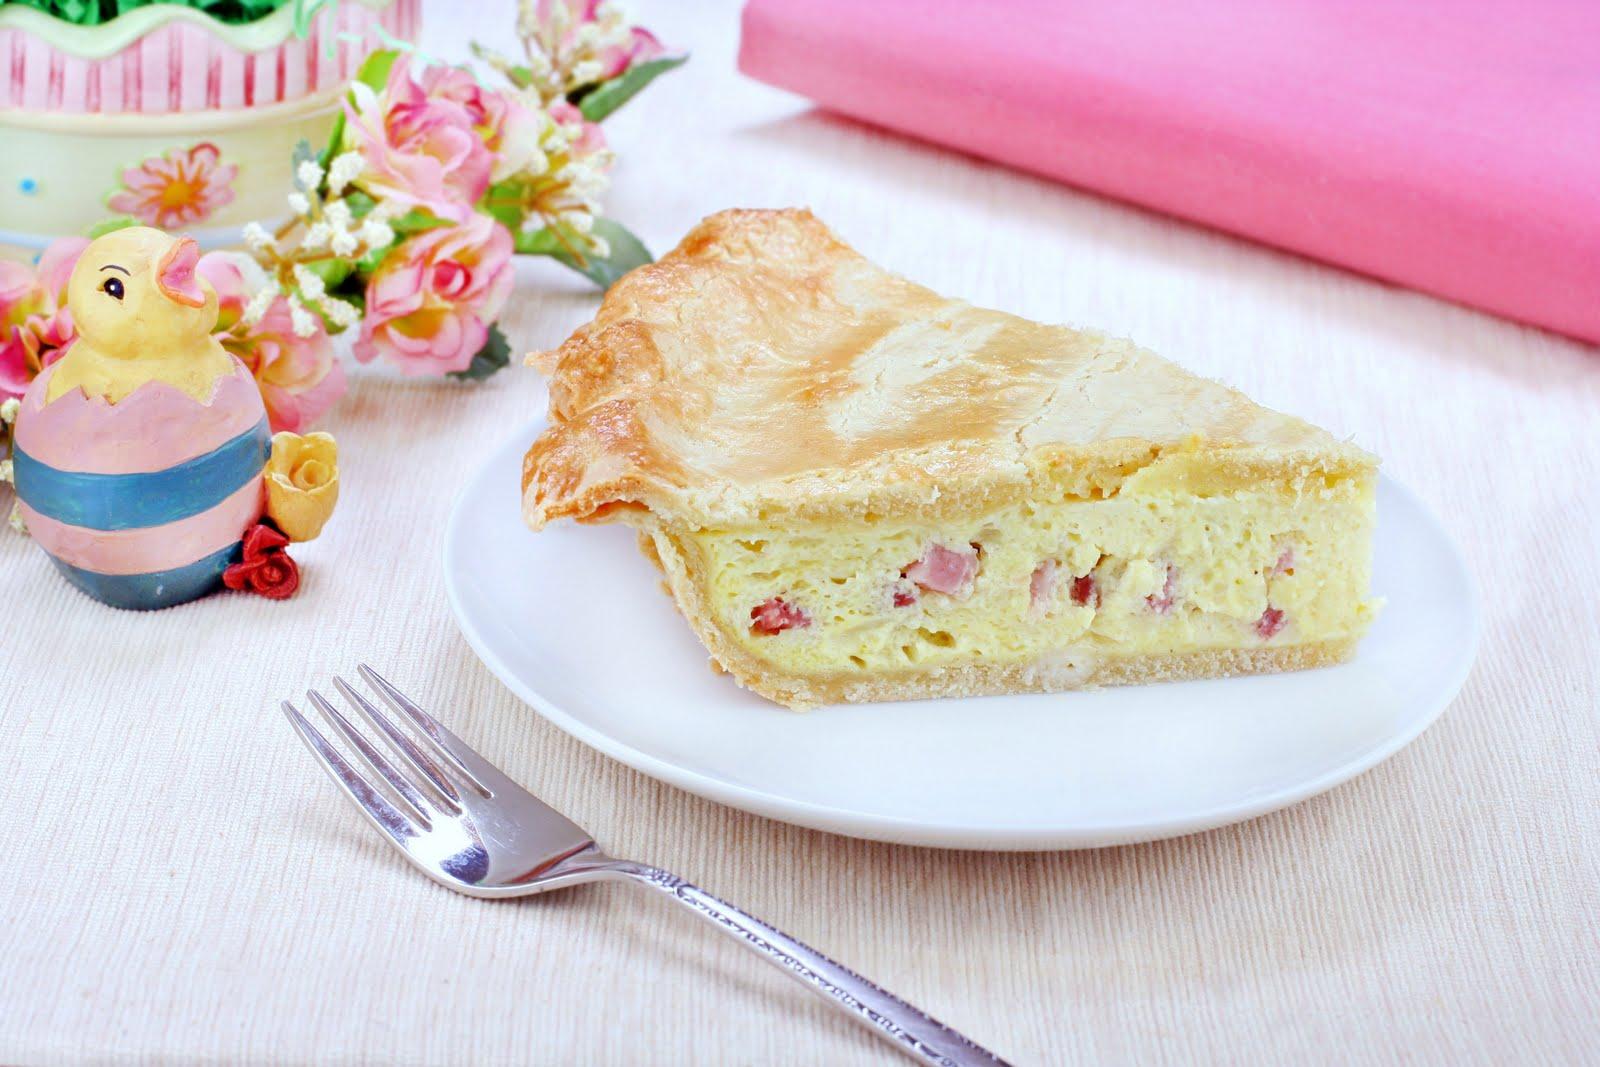 Andrea Correale's Elegant Affairs: Easter Pie